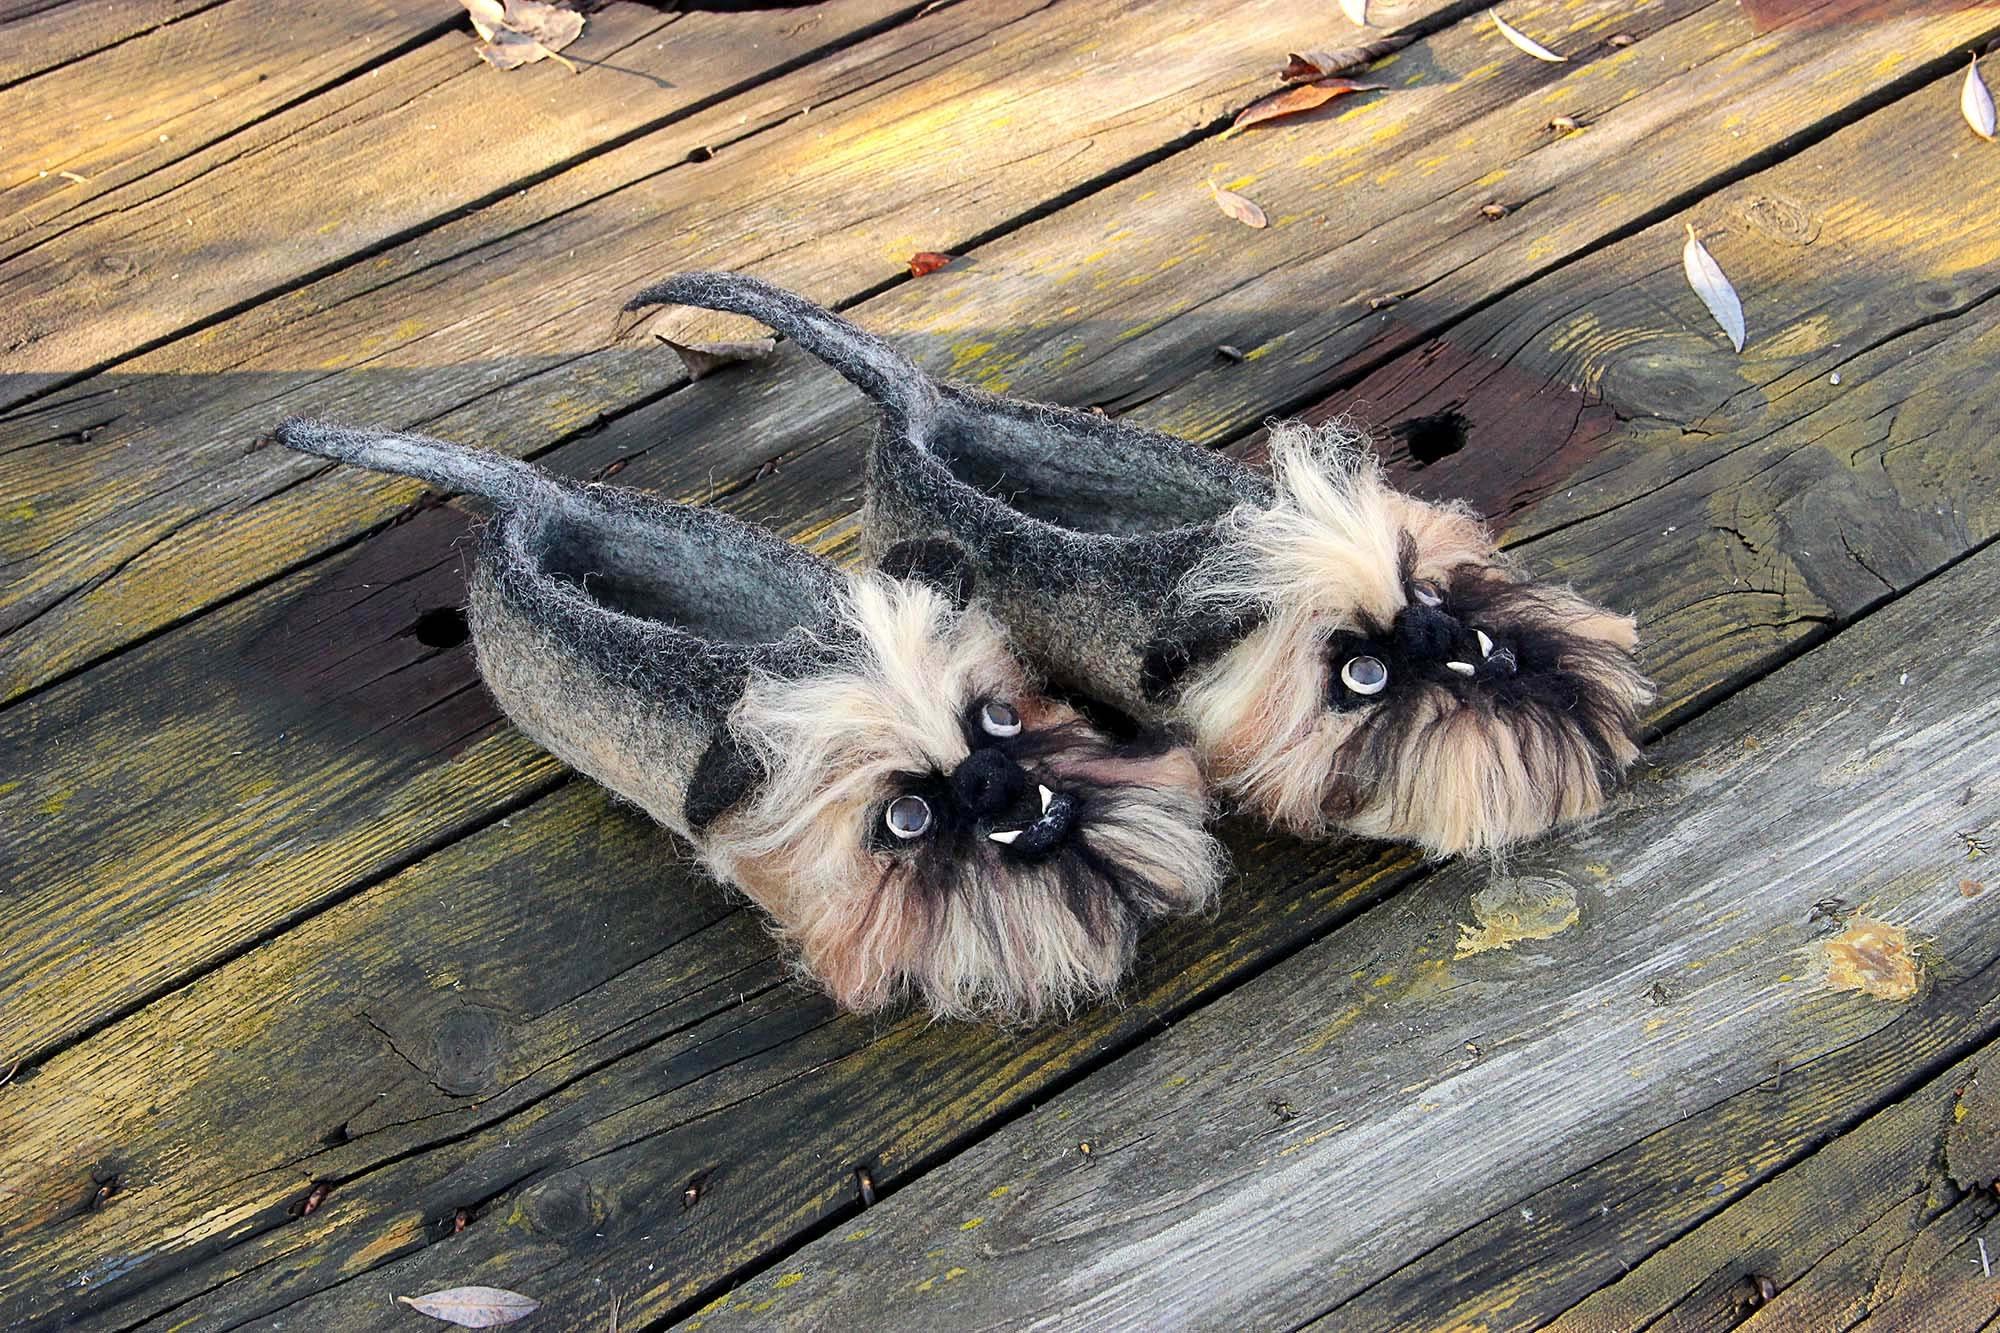 Dogs Brussels Griffon custom slippers, Griffon Bruxellois Shepherd, wool shoes, felted Belgian Shepherd, Bruxellois Griffon Belge, Petit Brabançon any breed dog 10ee44